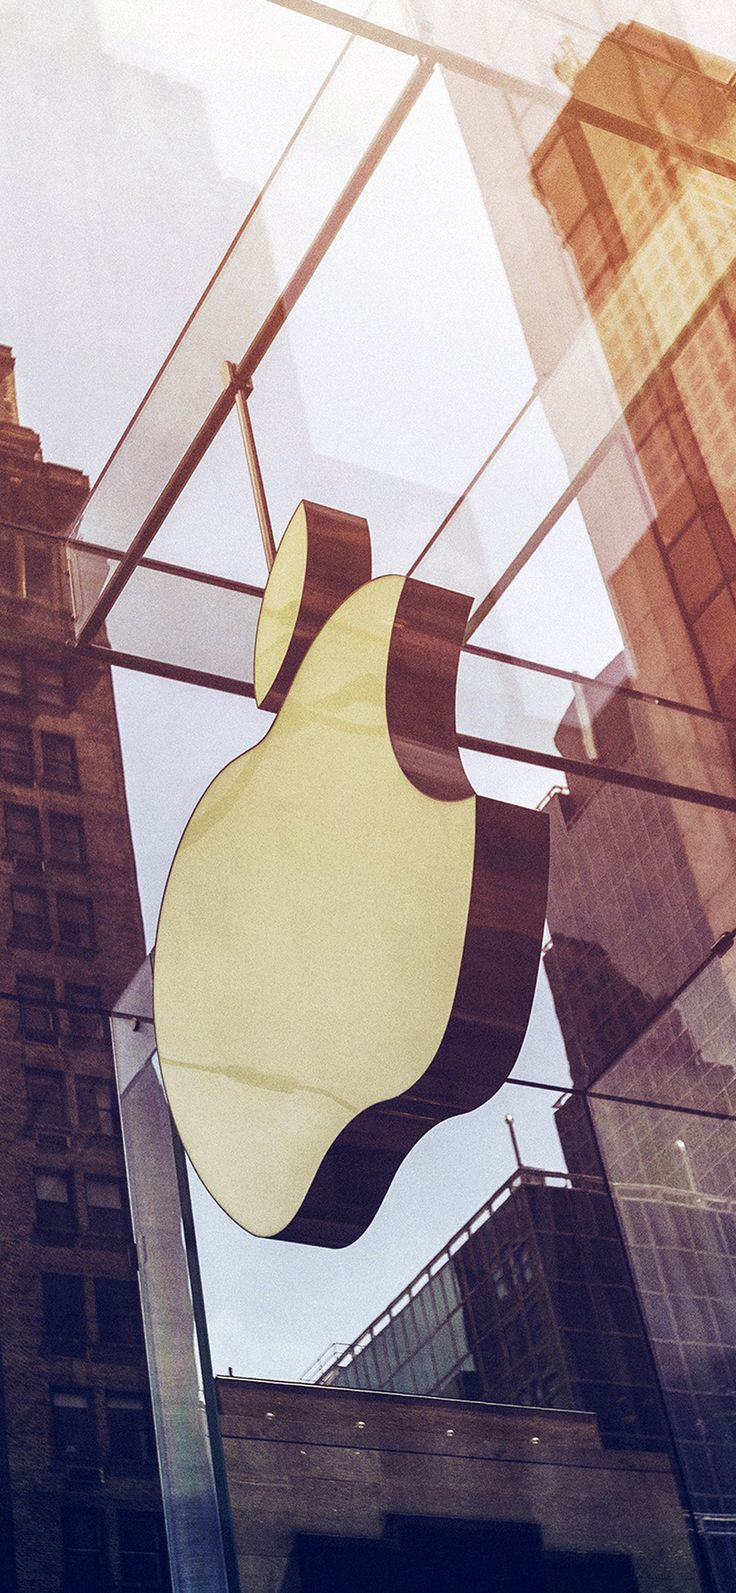 Iphone X Wallpaper Oa39 Apple Newyork City Logo Nature Sunny Via